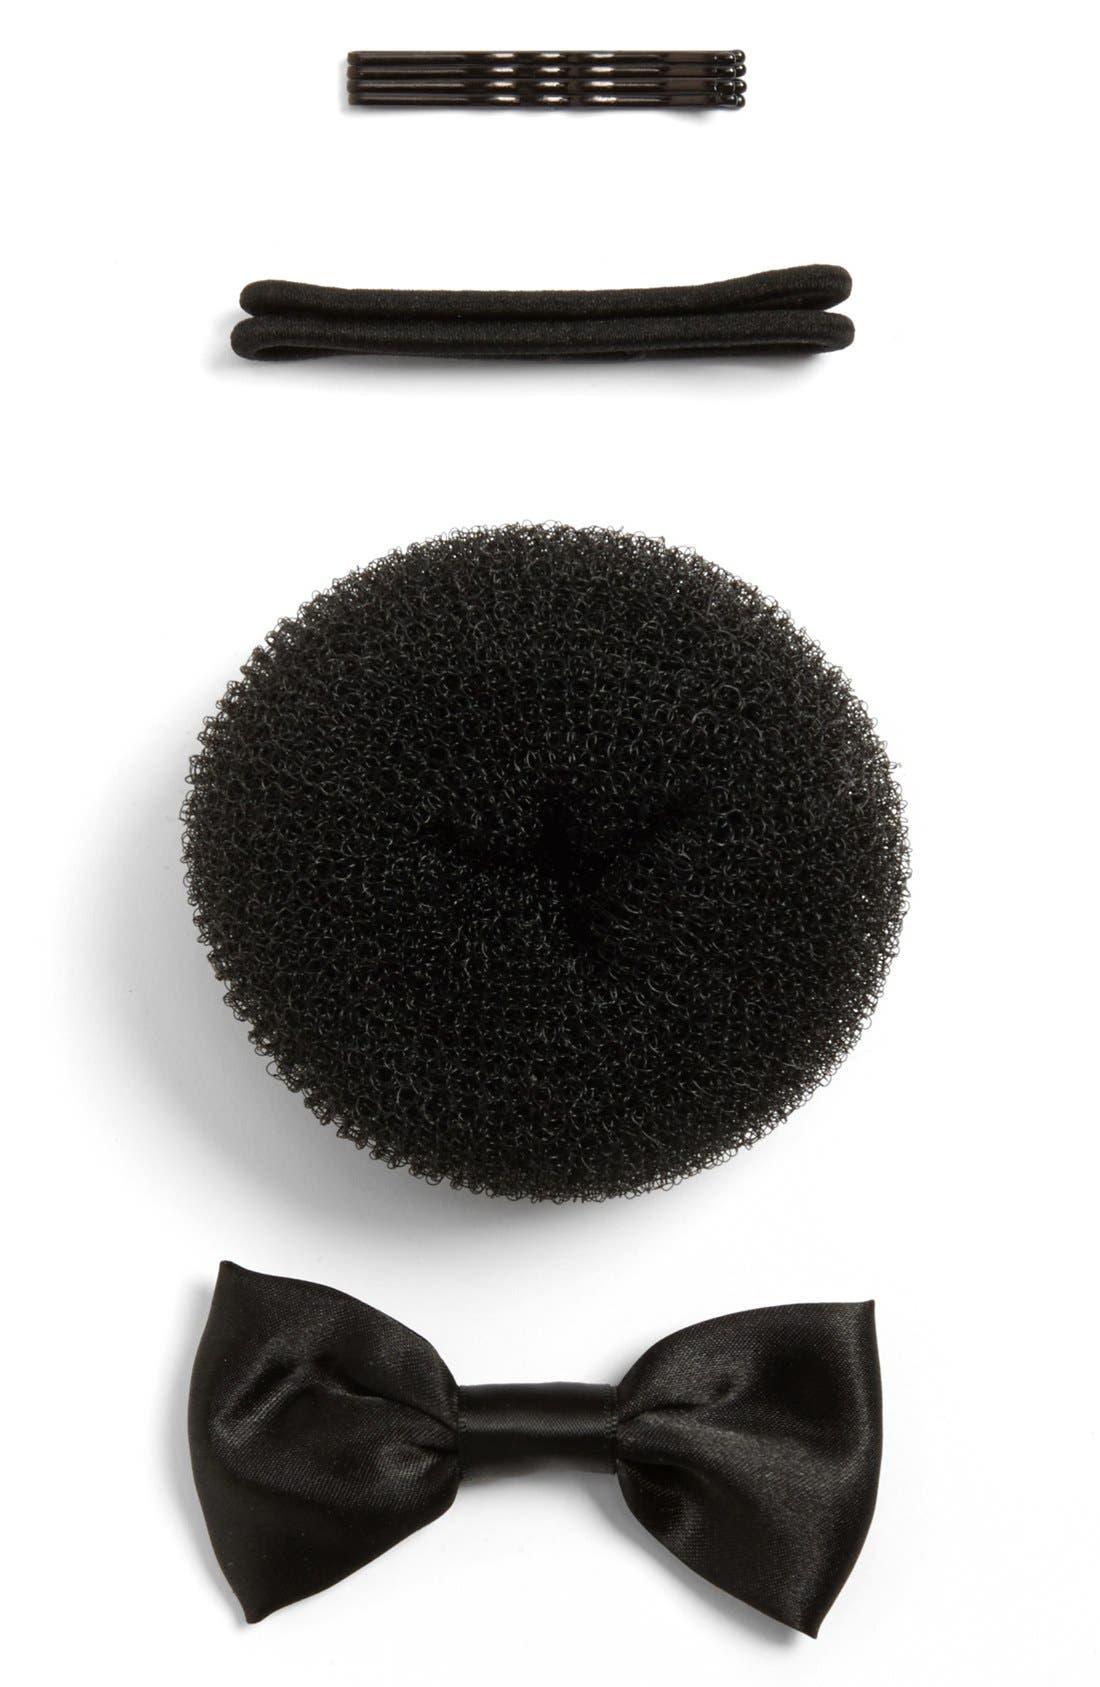 Main Image - Capelli of New York Bow & Bun Shaper Kit (Juniors) (Online Only)